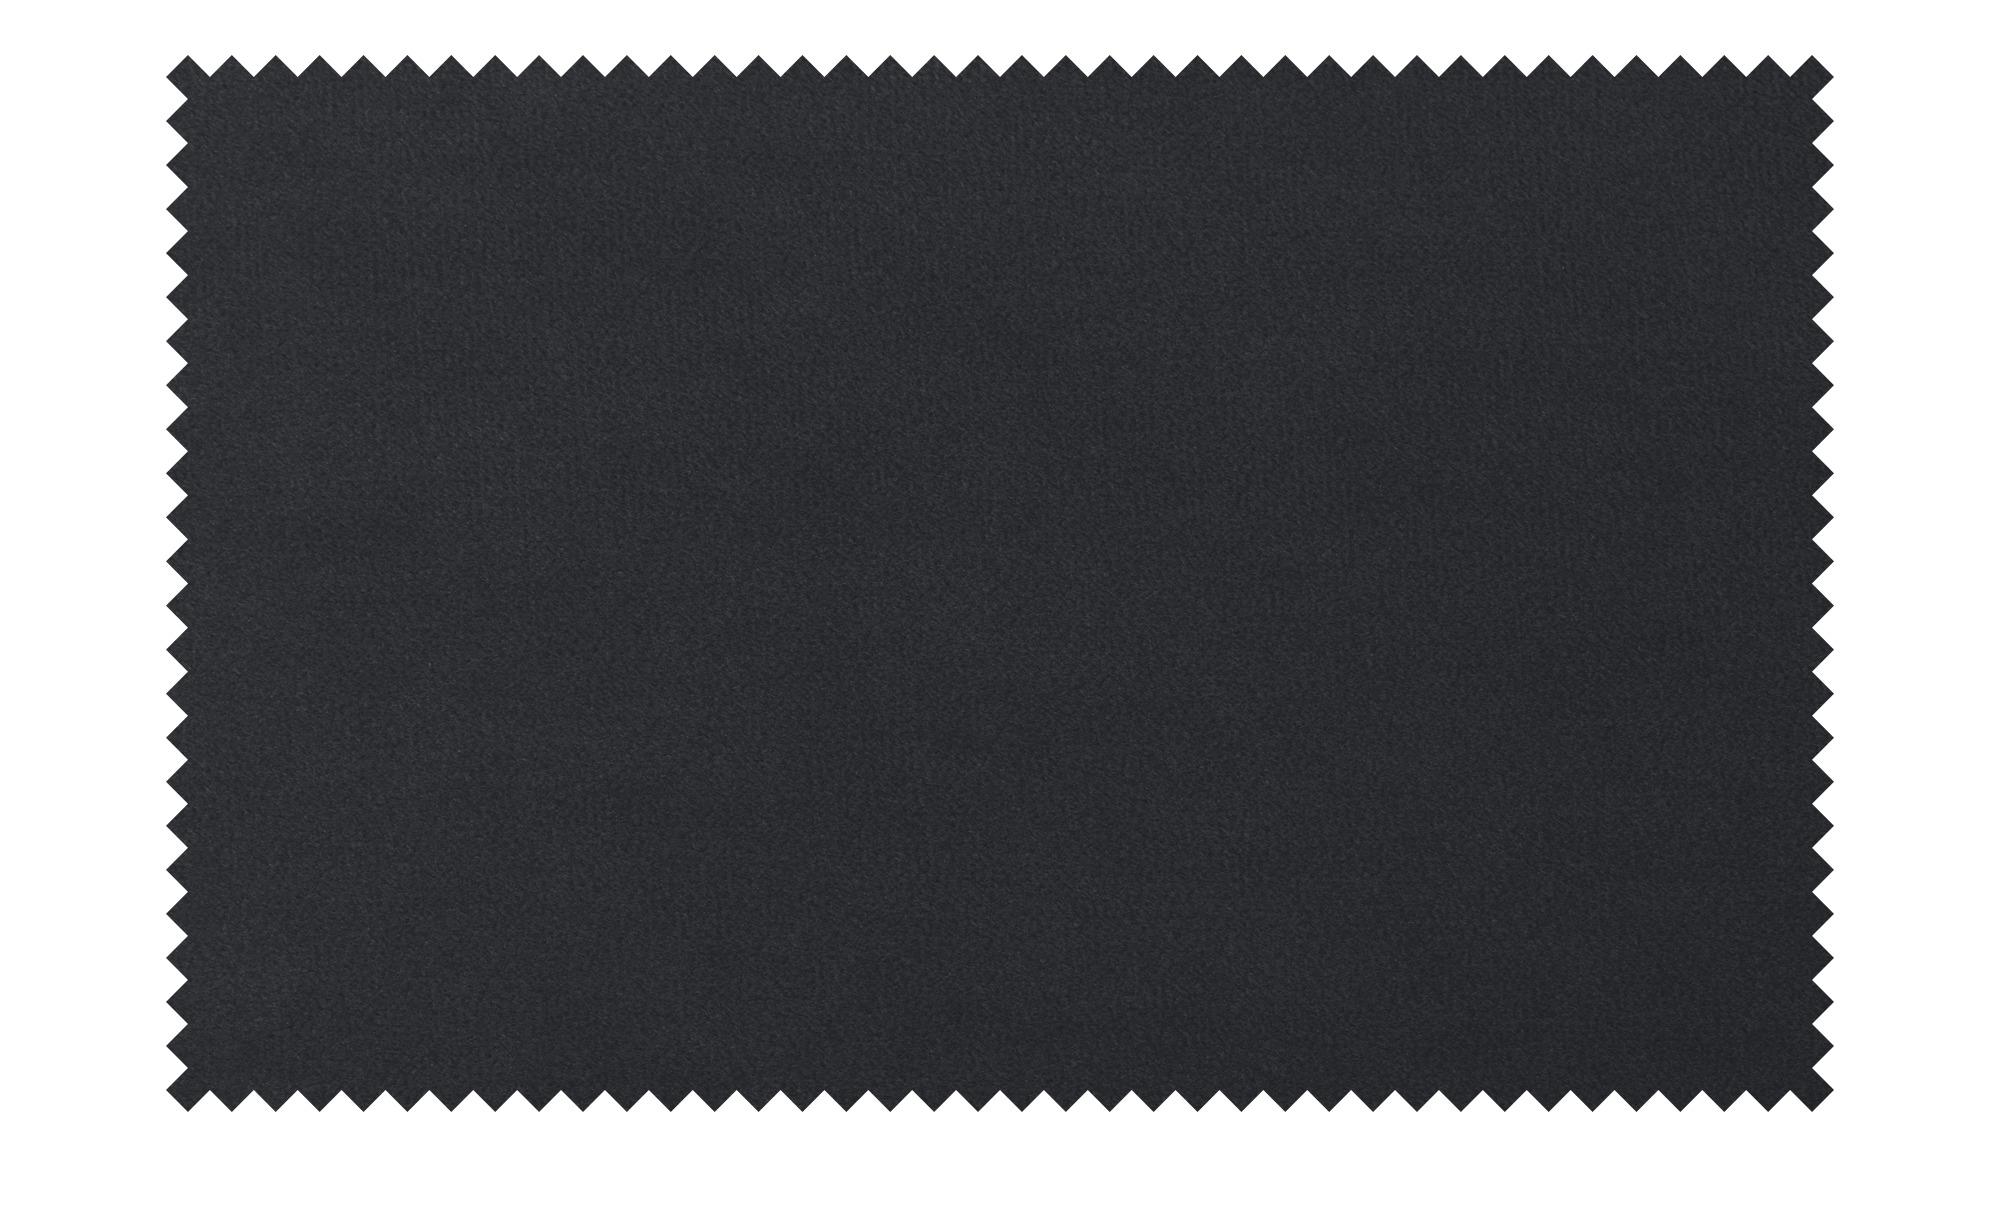 pop Hochlehnsessel  Caldara ¦ schwarz ¦ Maße (cm): B: 100 H: 106 T: 95 Polstermöbel > Sessel > Ohrensessel - Höffner